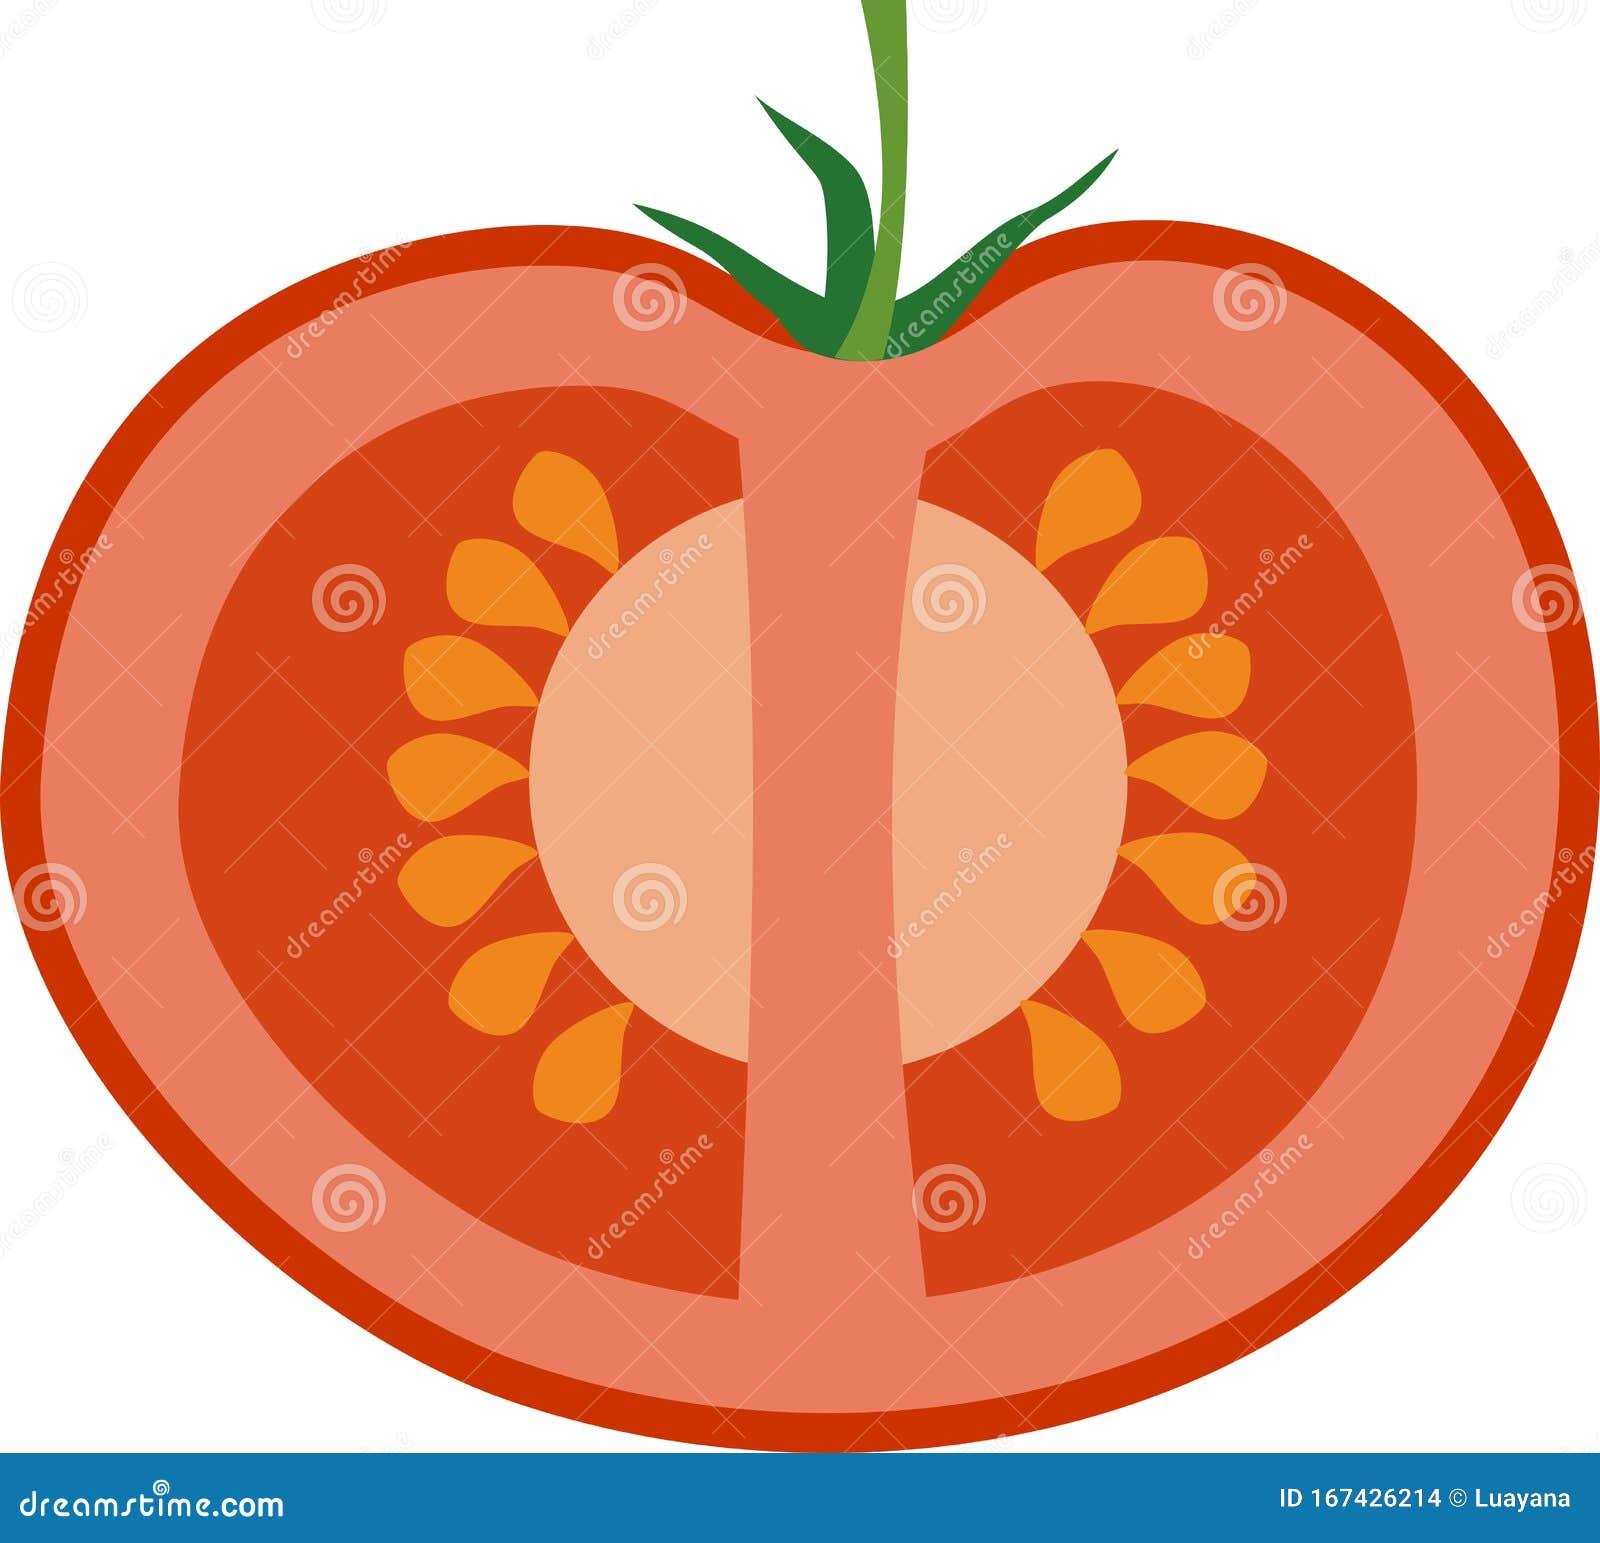 Tomato Cross Section Stock Illustrations – 138 Tomato Cross Section Stock  Illustrations, Vectors & Clipart - DreamstimeDreamstime.com